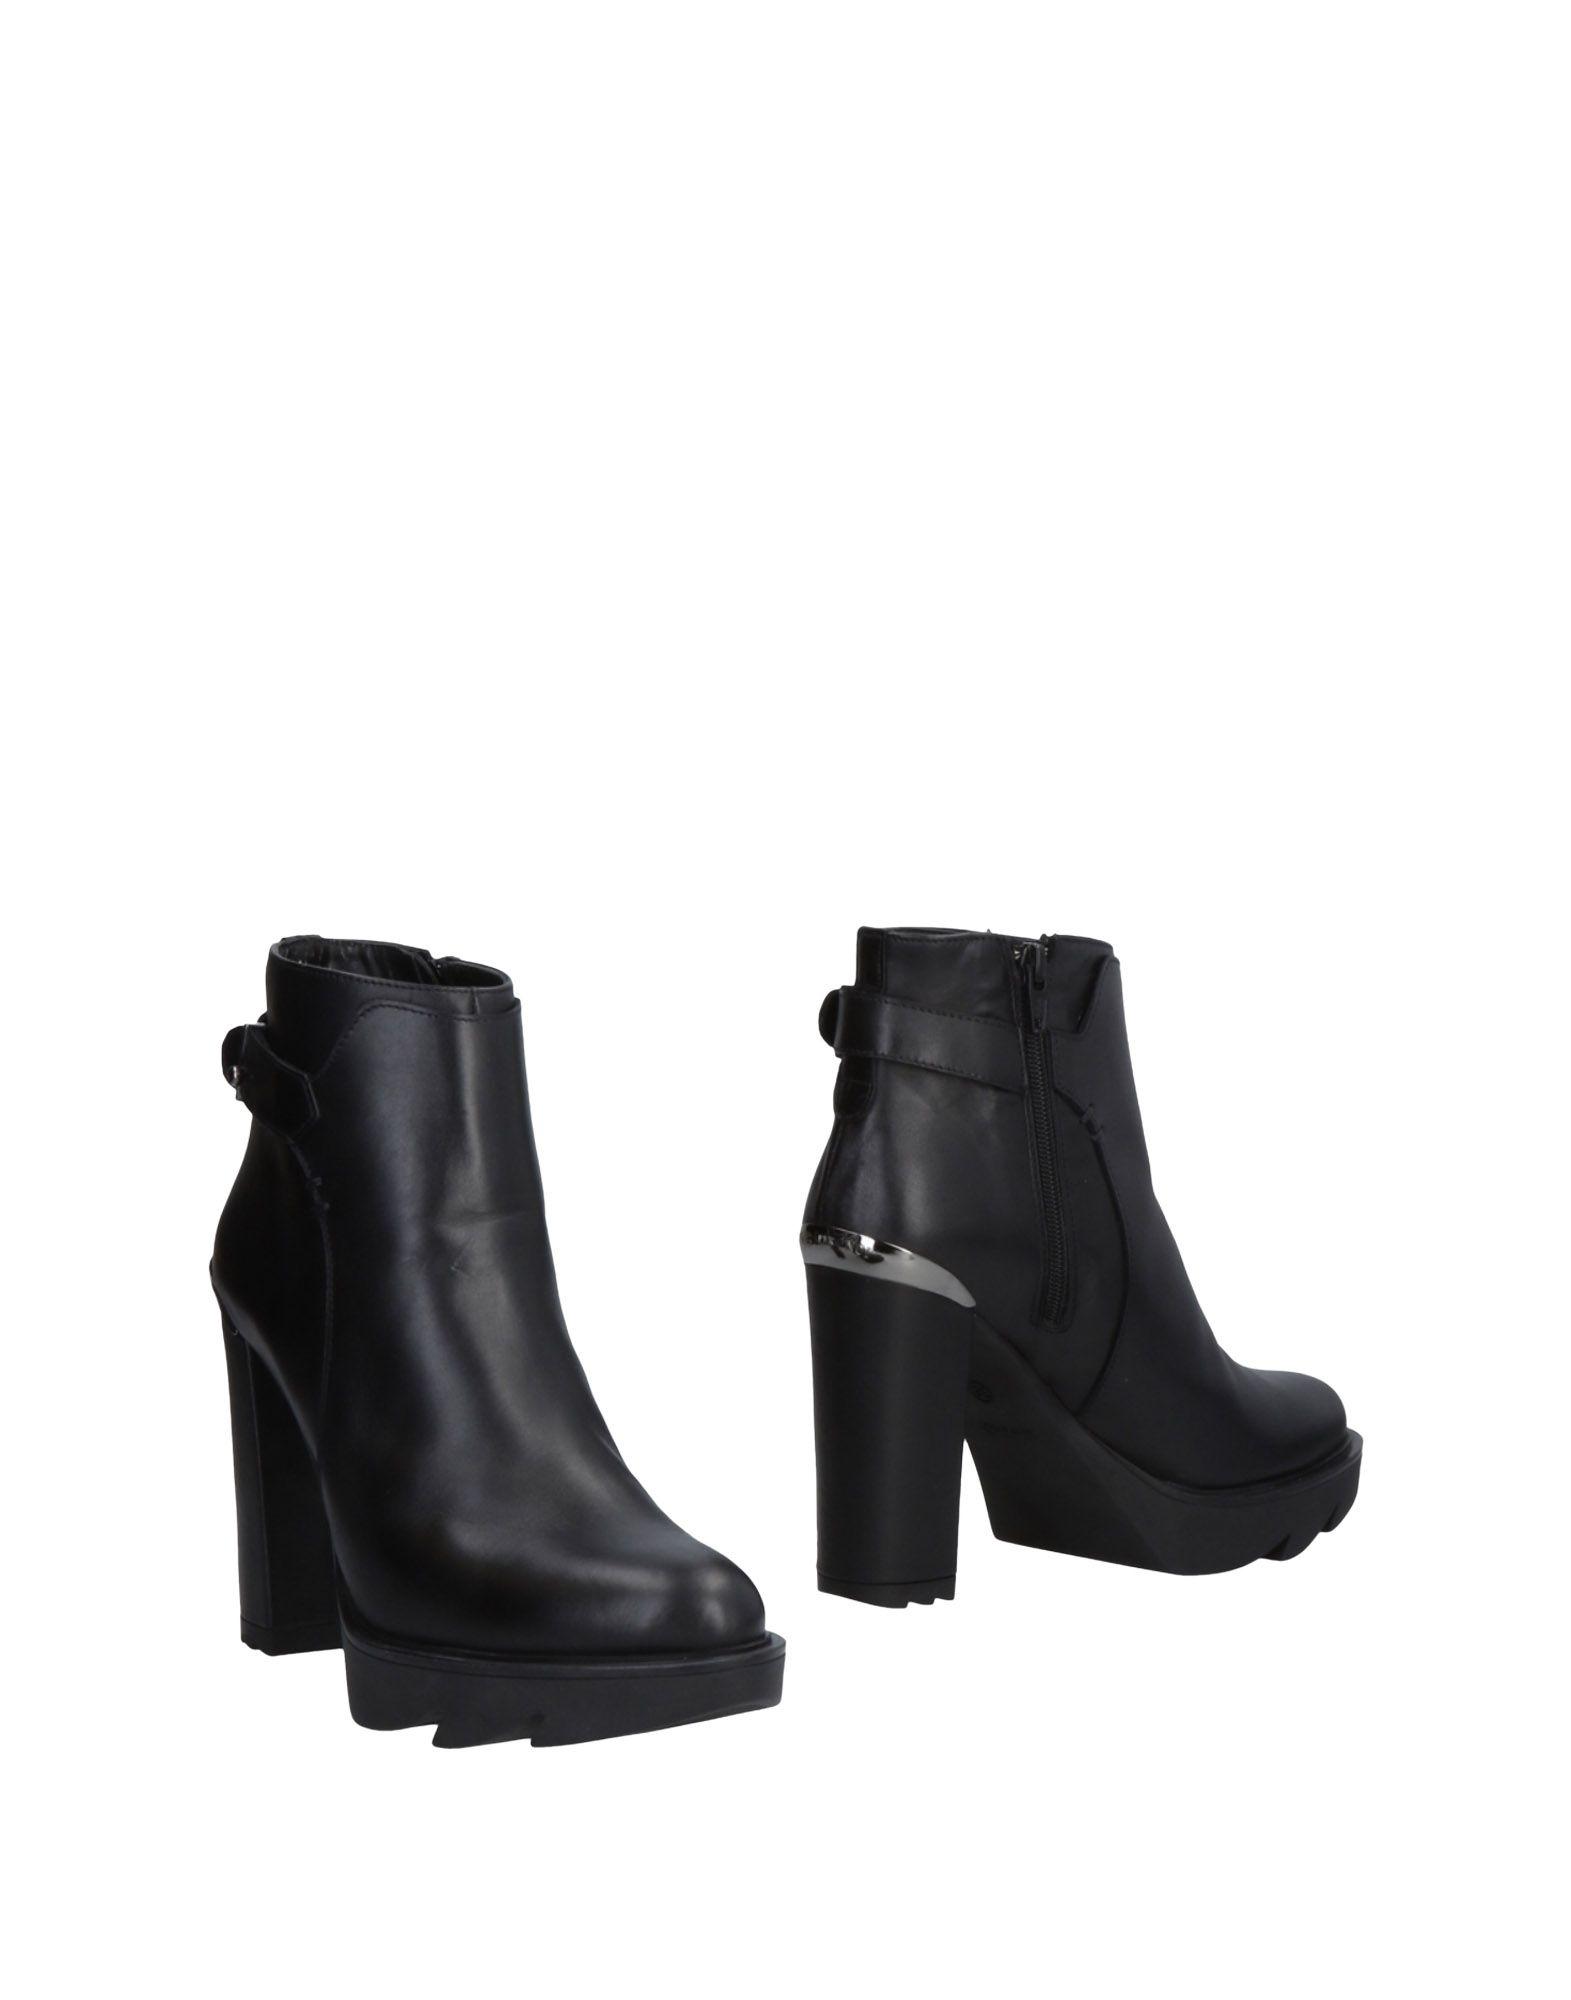 G.P. Per Noy Bologna Stiefelette Damen beliebte  11456279JW Gute Qualität beliebte Damen Schuhe 98202d